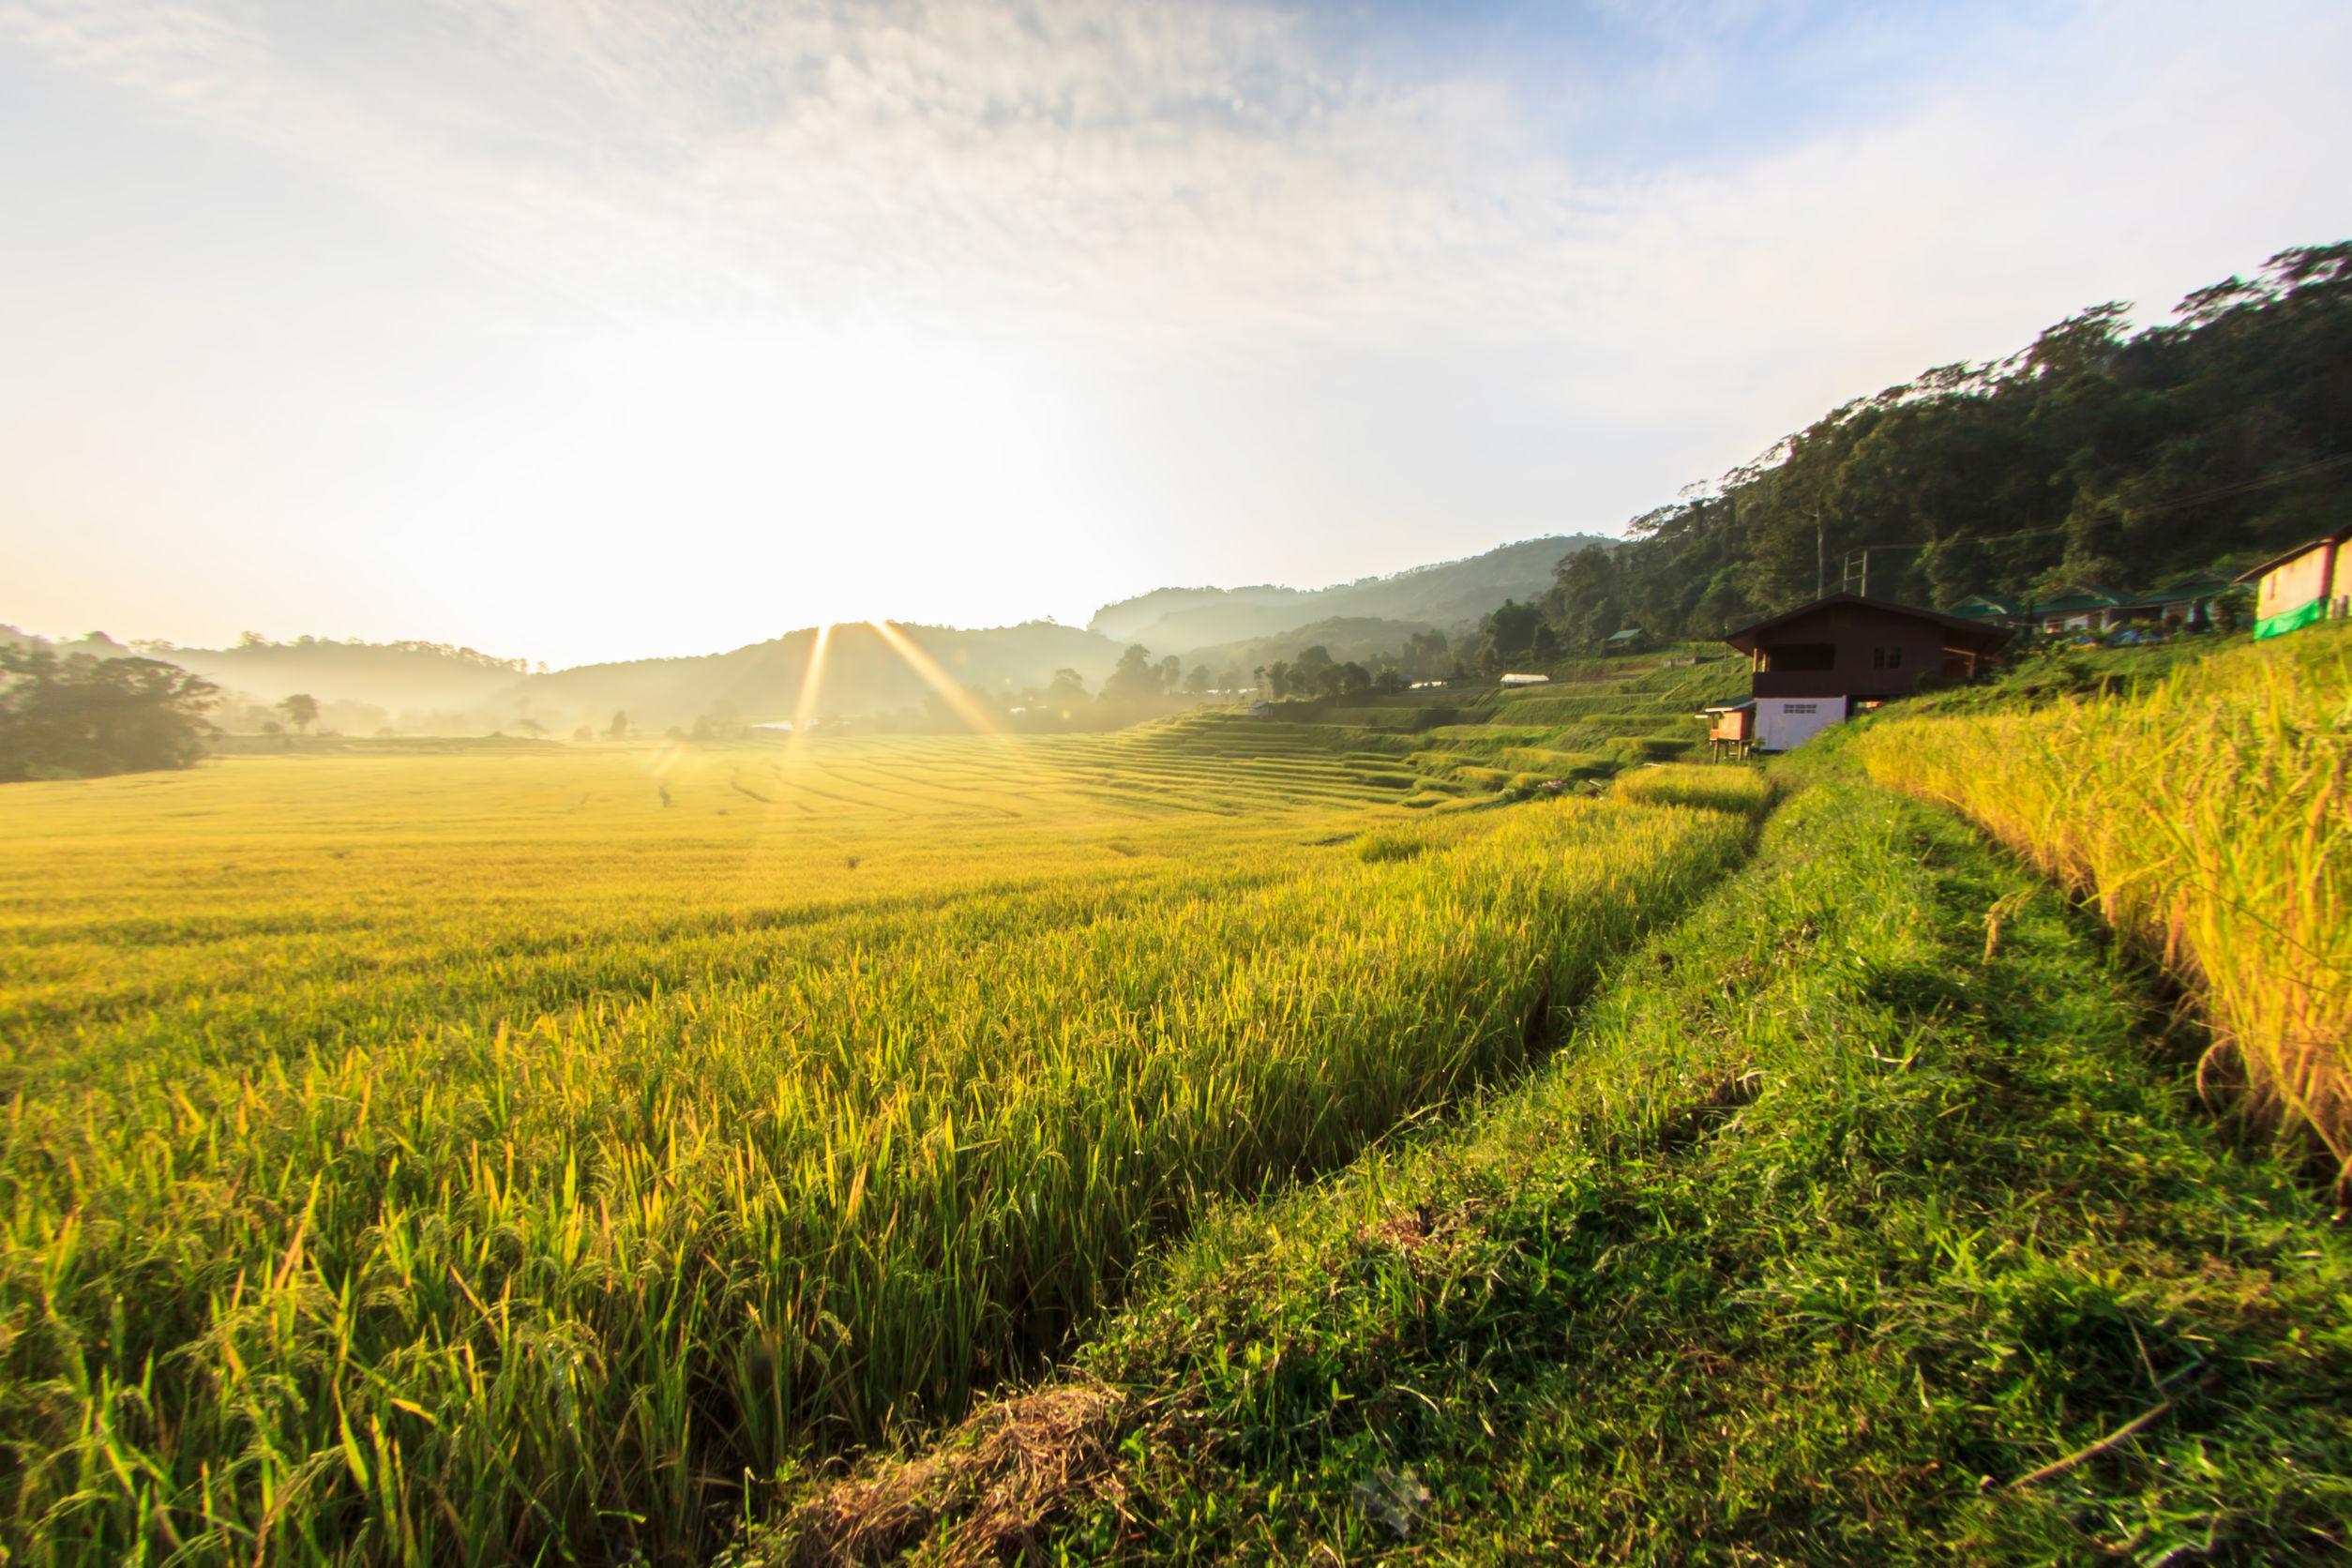 FARM & AGRICULTURE Seed